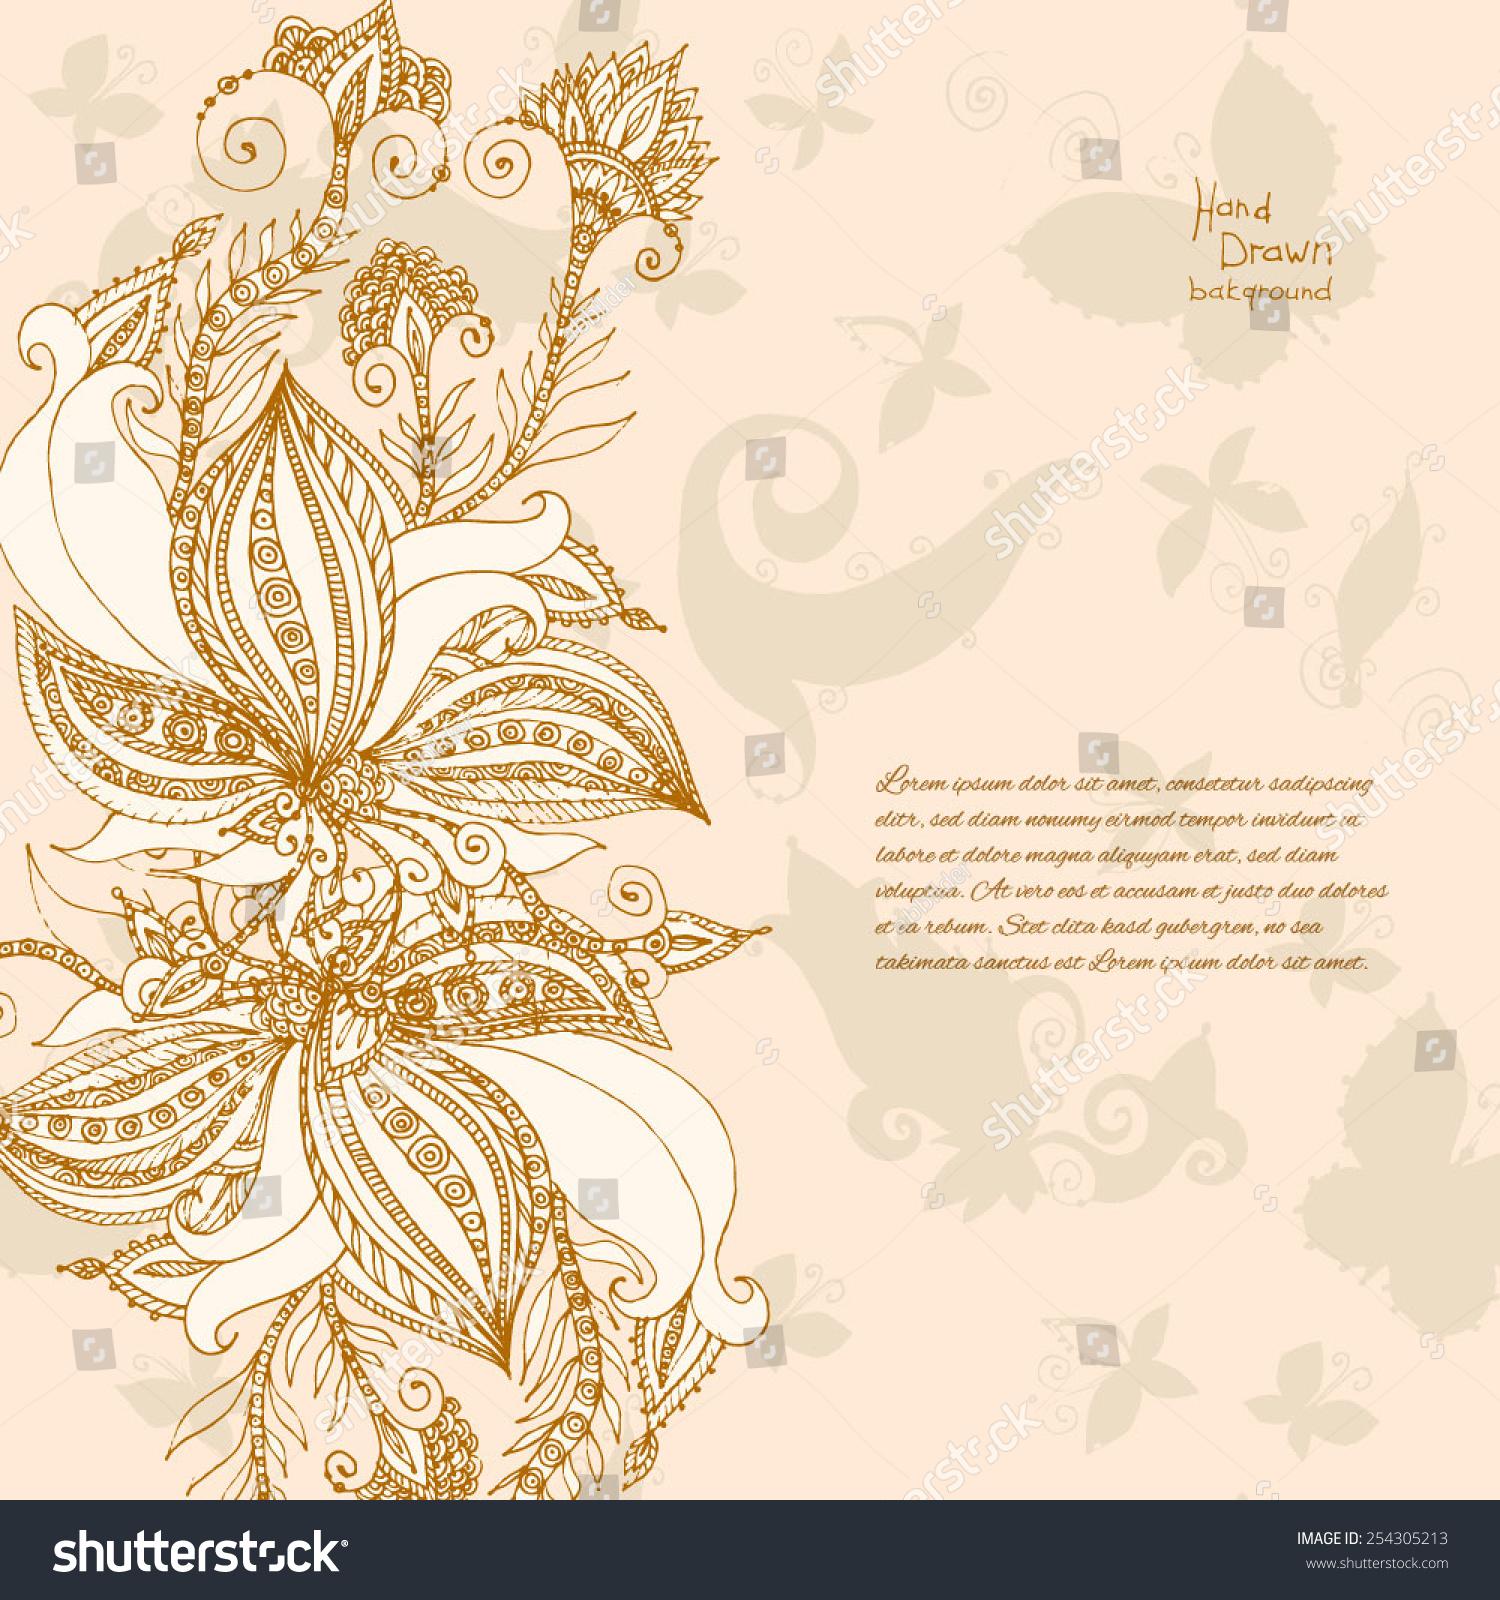 batik vector background stock vector royalty free 254305213 https www shutterstock com image vector batik vector background 254305213